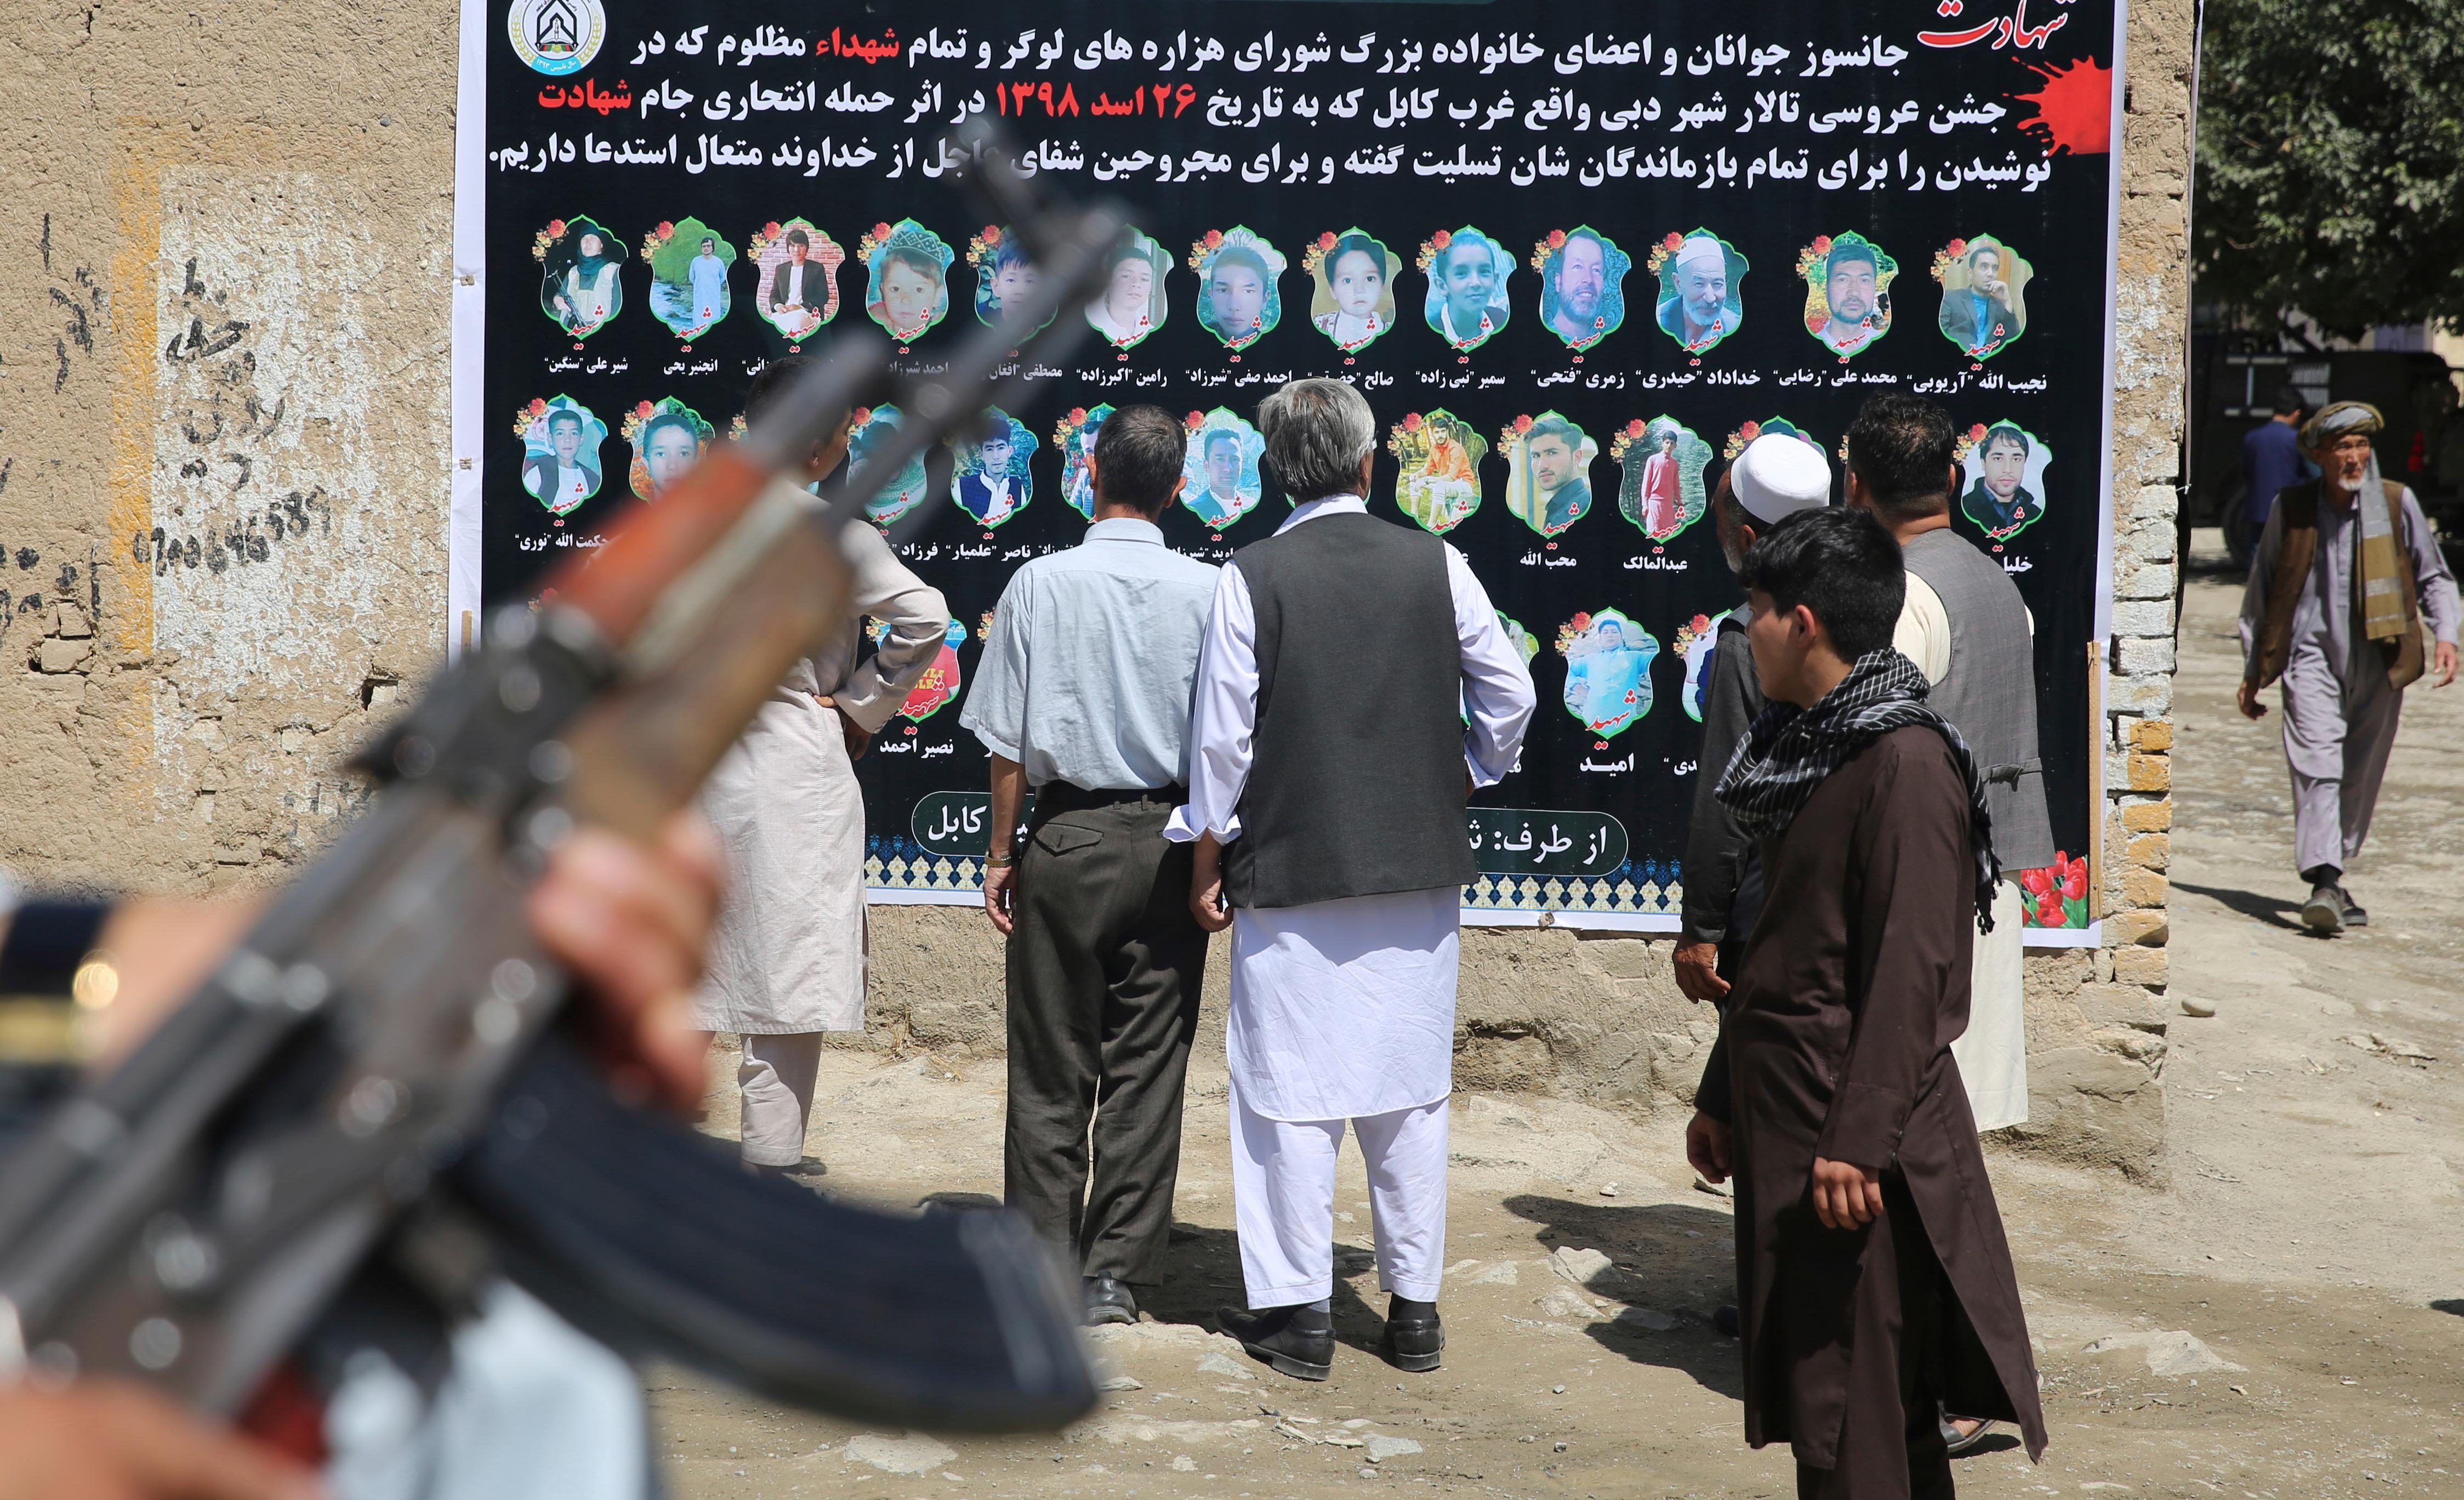 US Envoy To Resume Talks With Taliban On Ending Afghan War KATU